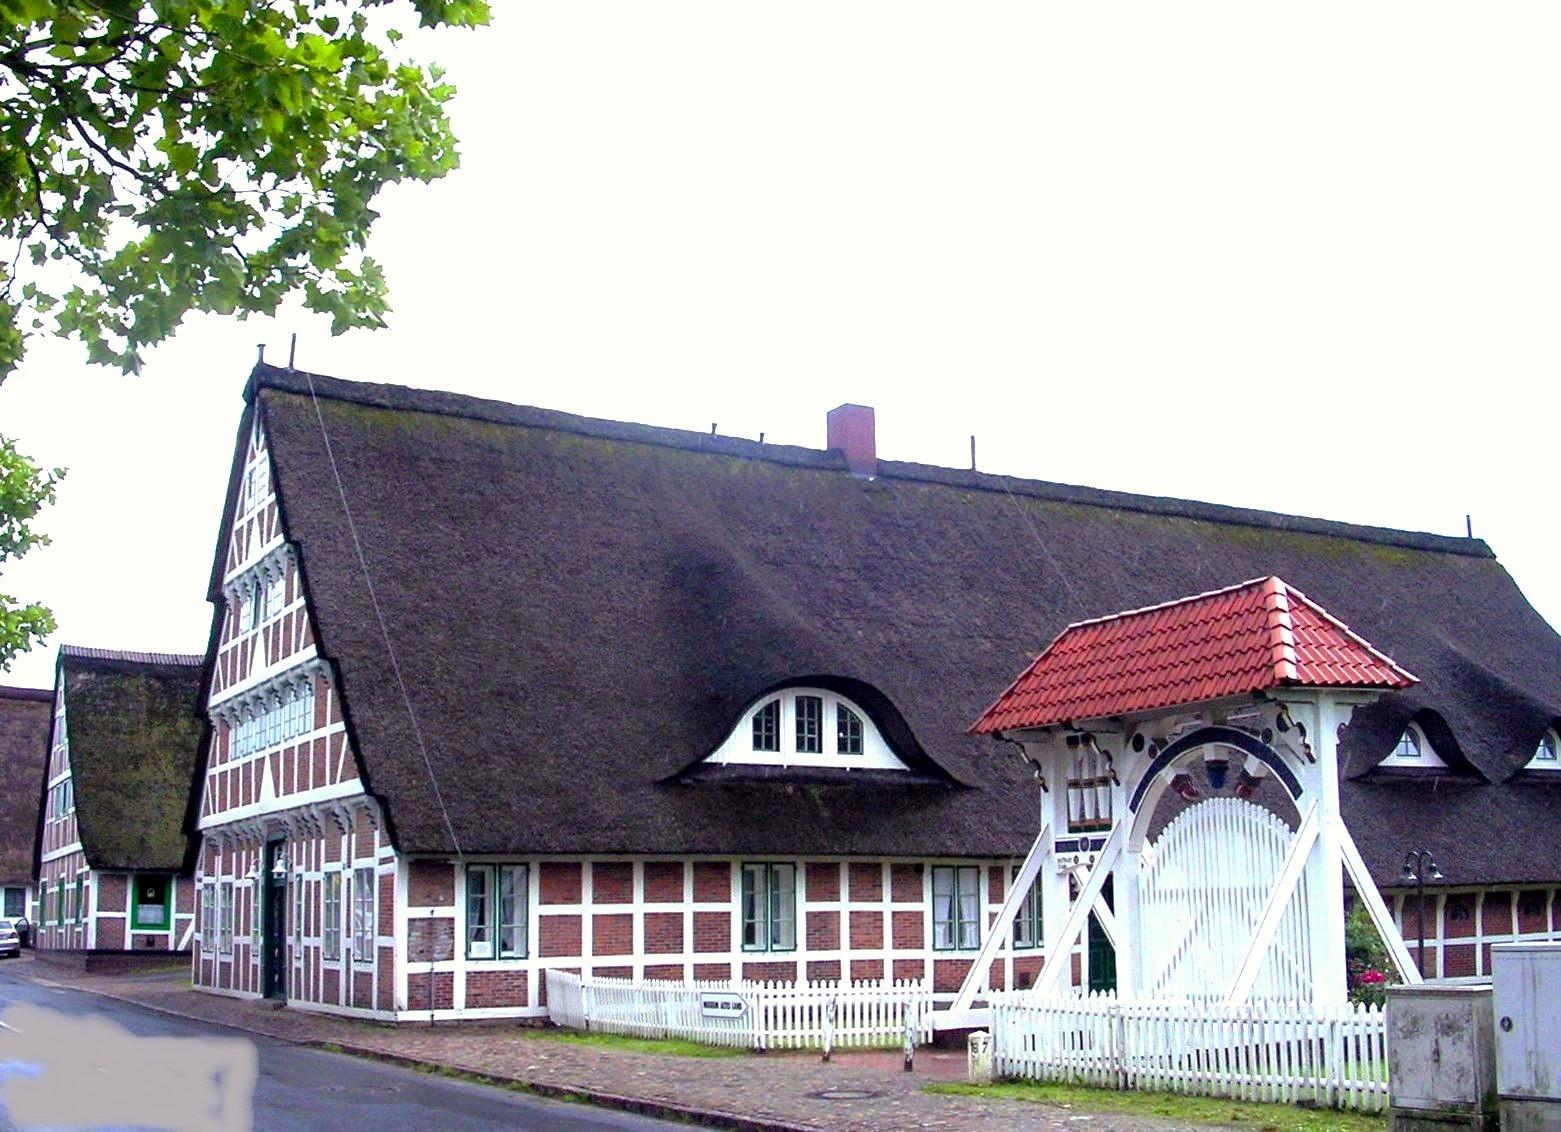 e-altes-land-std-1850-mit-prunkpforte